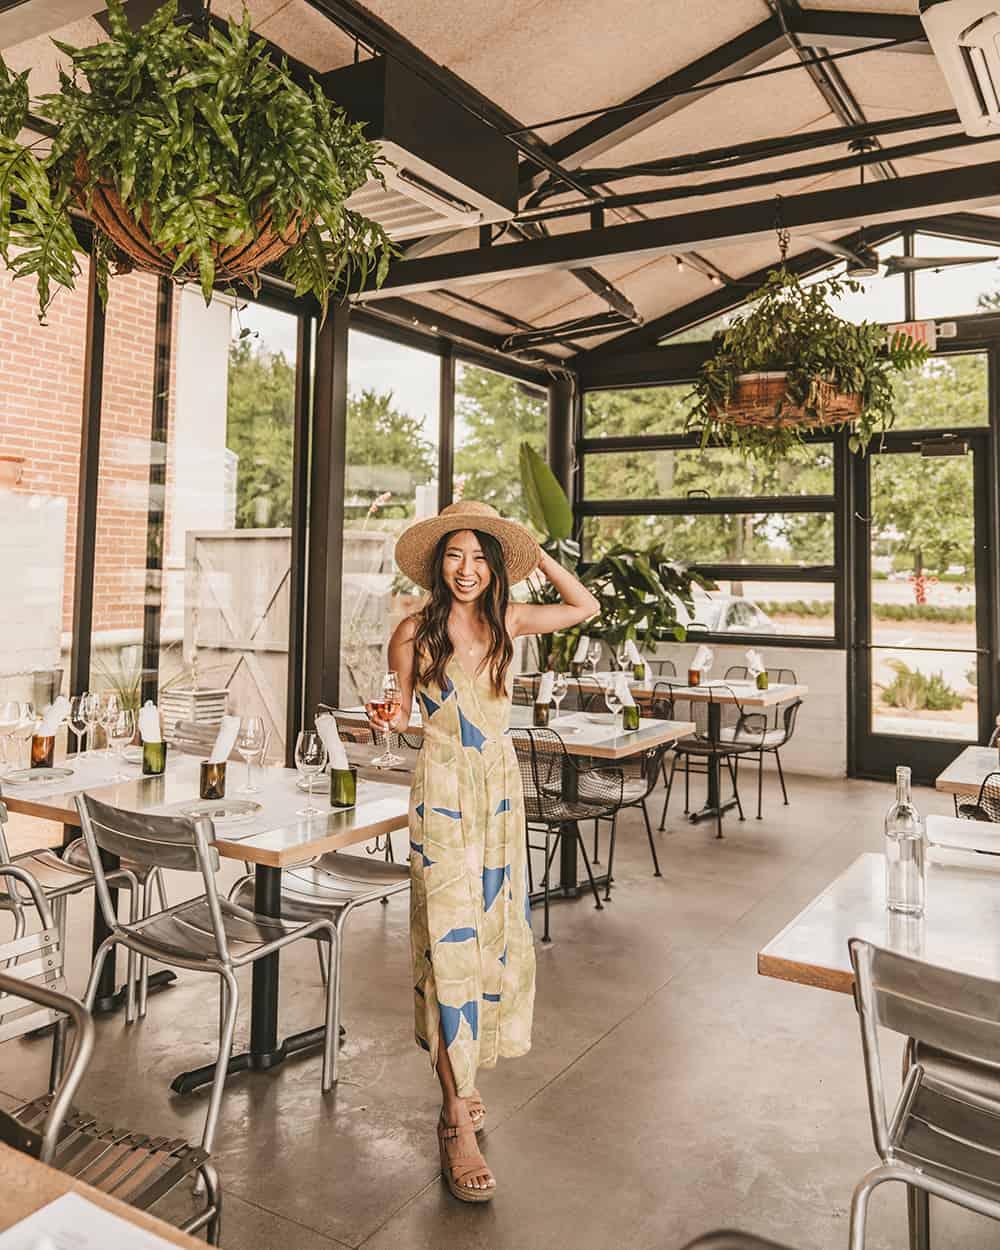 Sixty Vines in Plano Texas